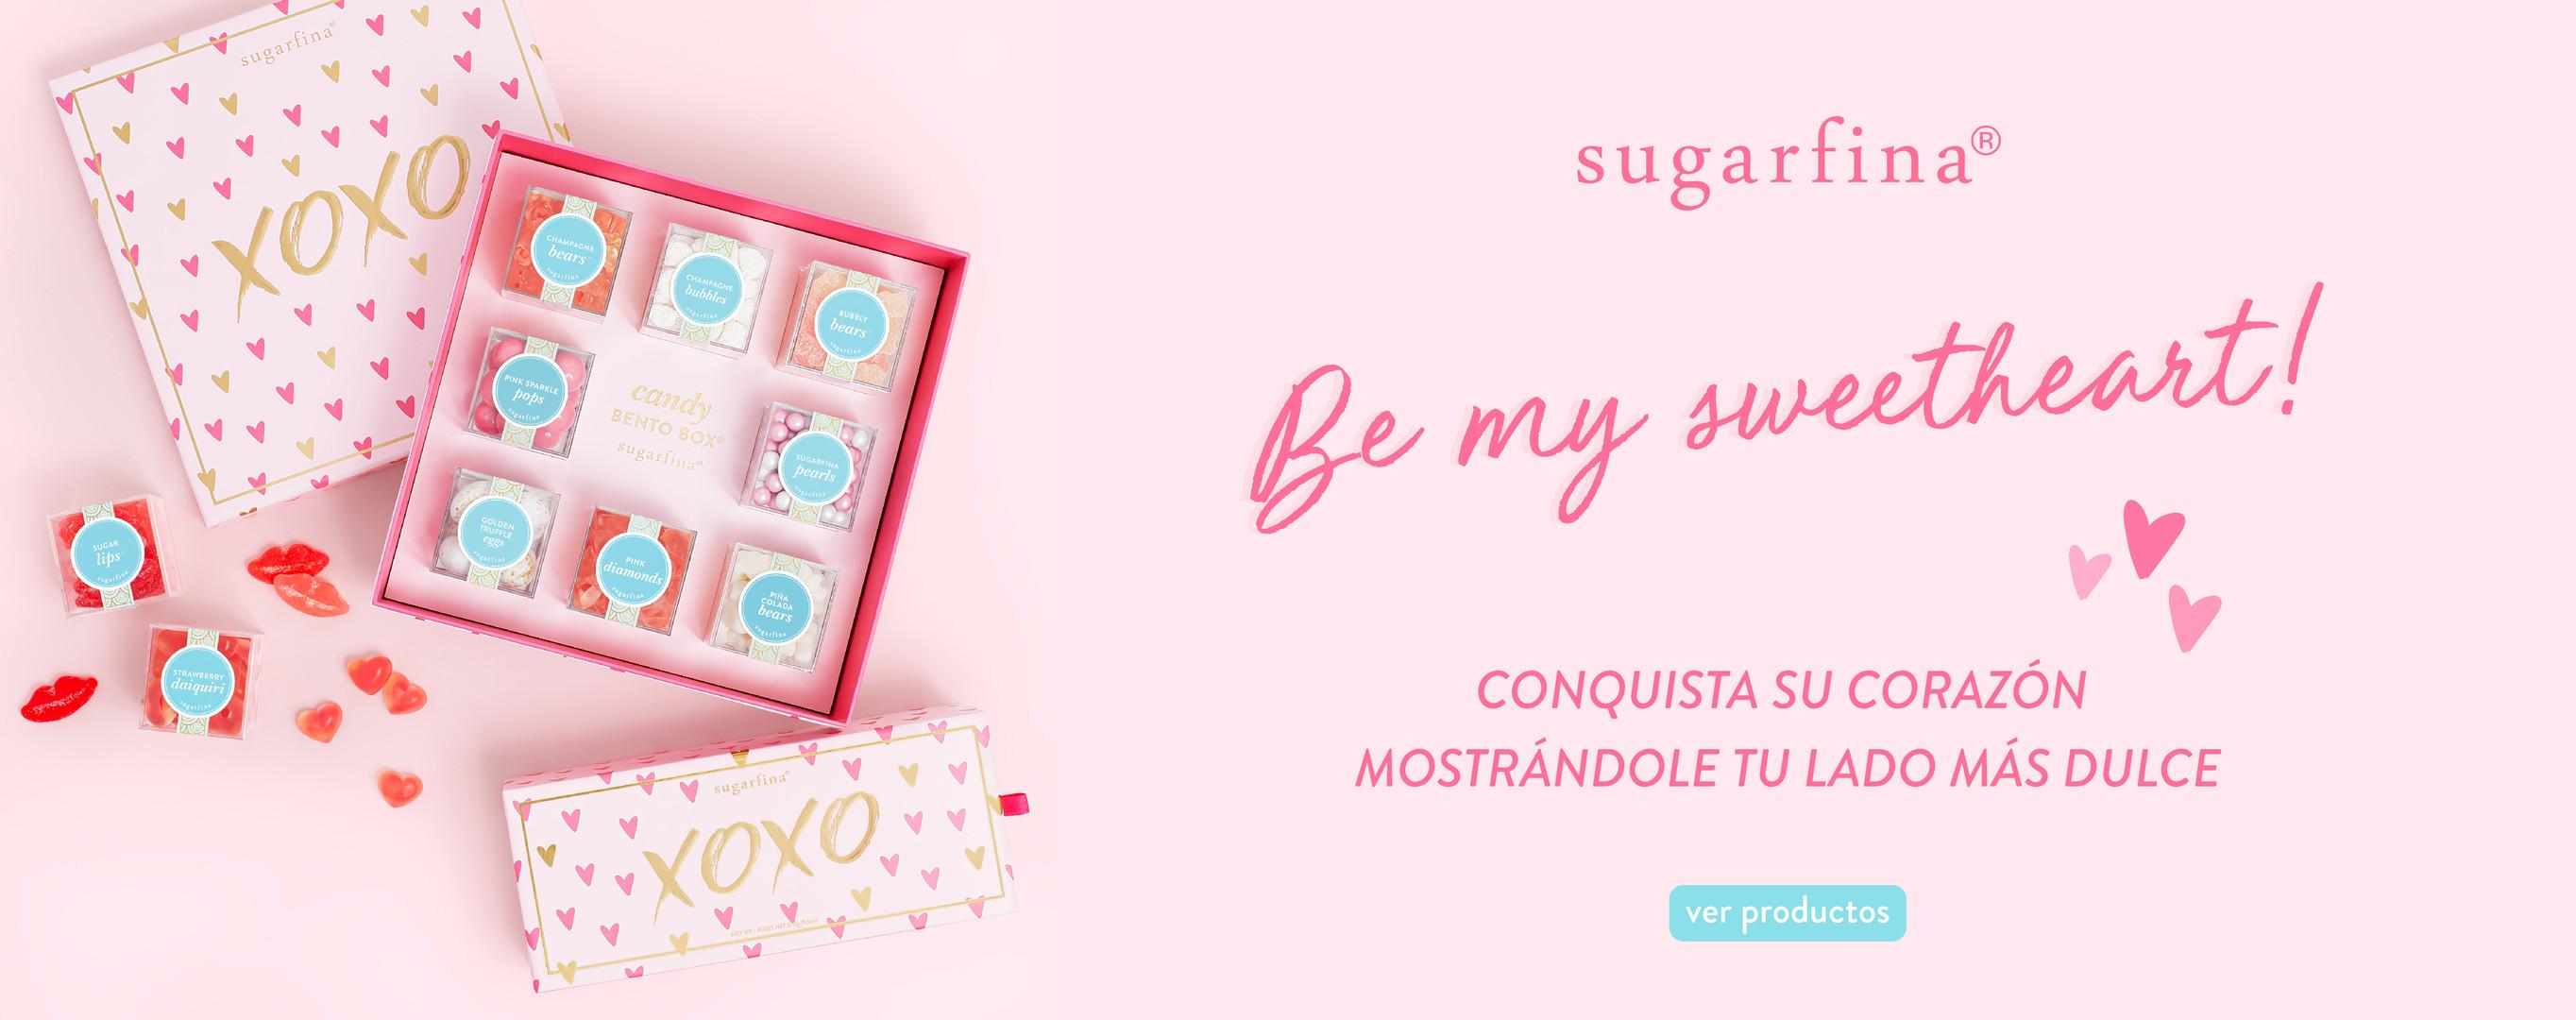 header_TGS_sugarfina_valentines_1.jpg